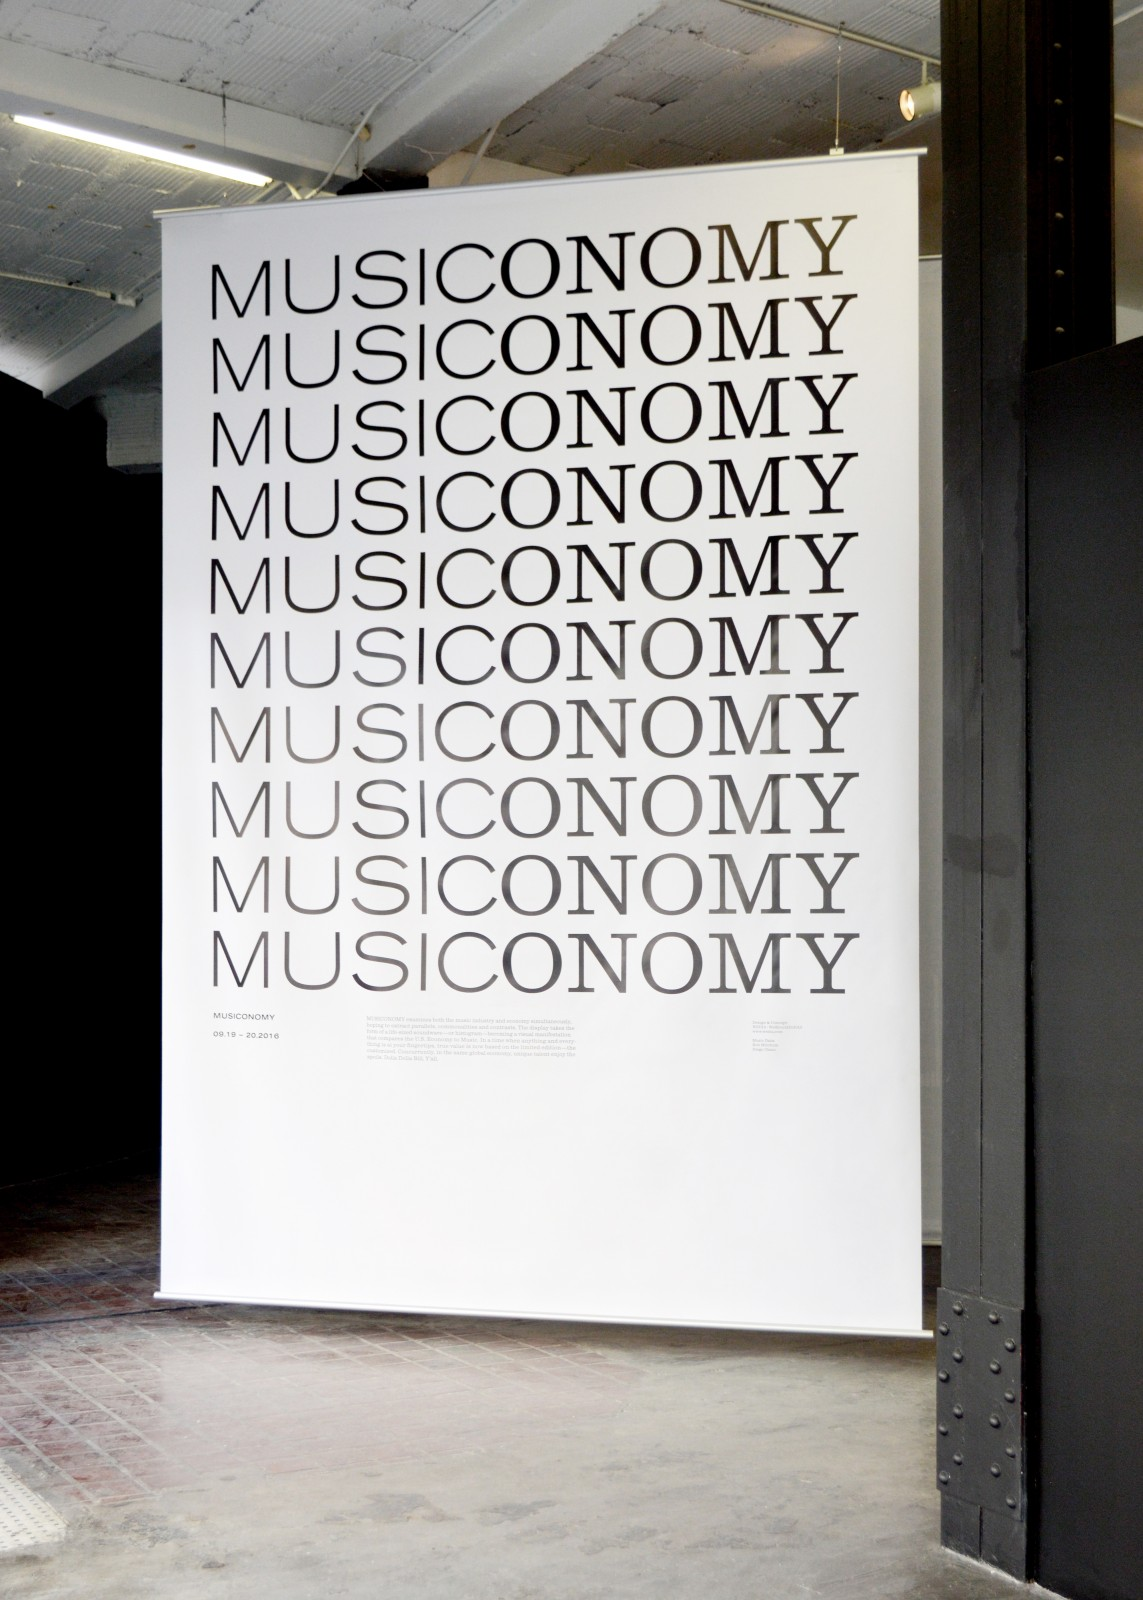 WeShouldDoItAll — Spotify Musiconomy